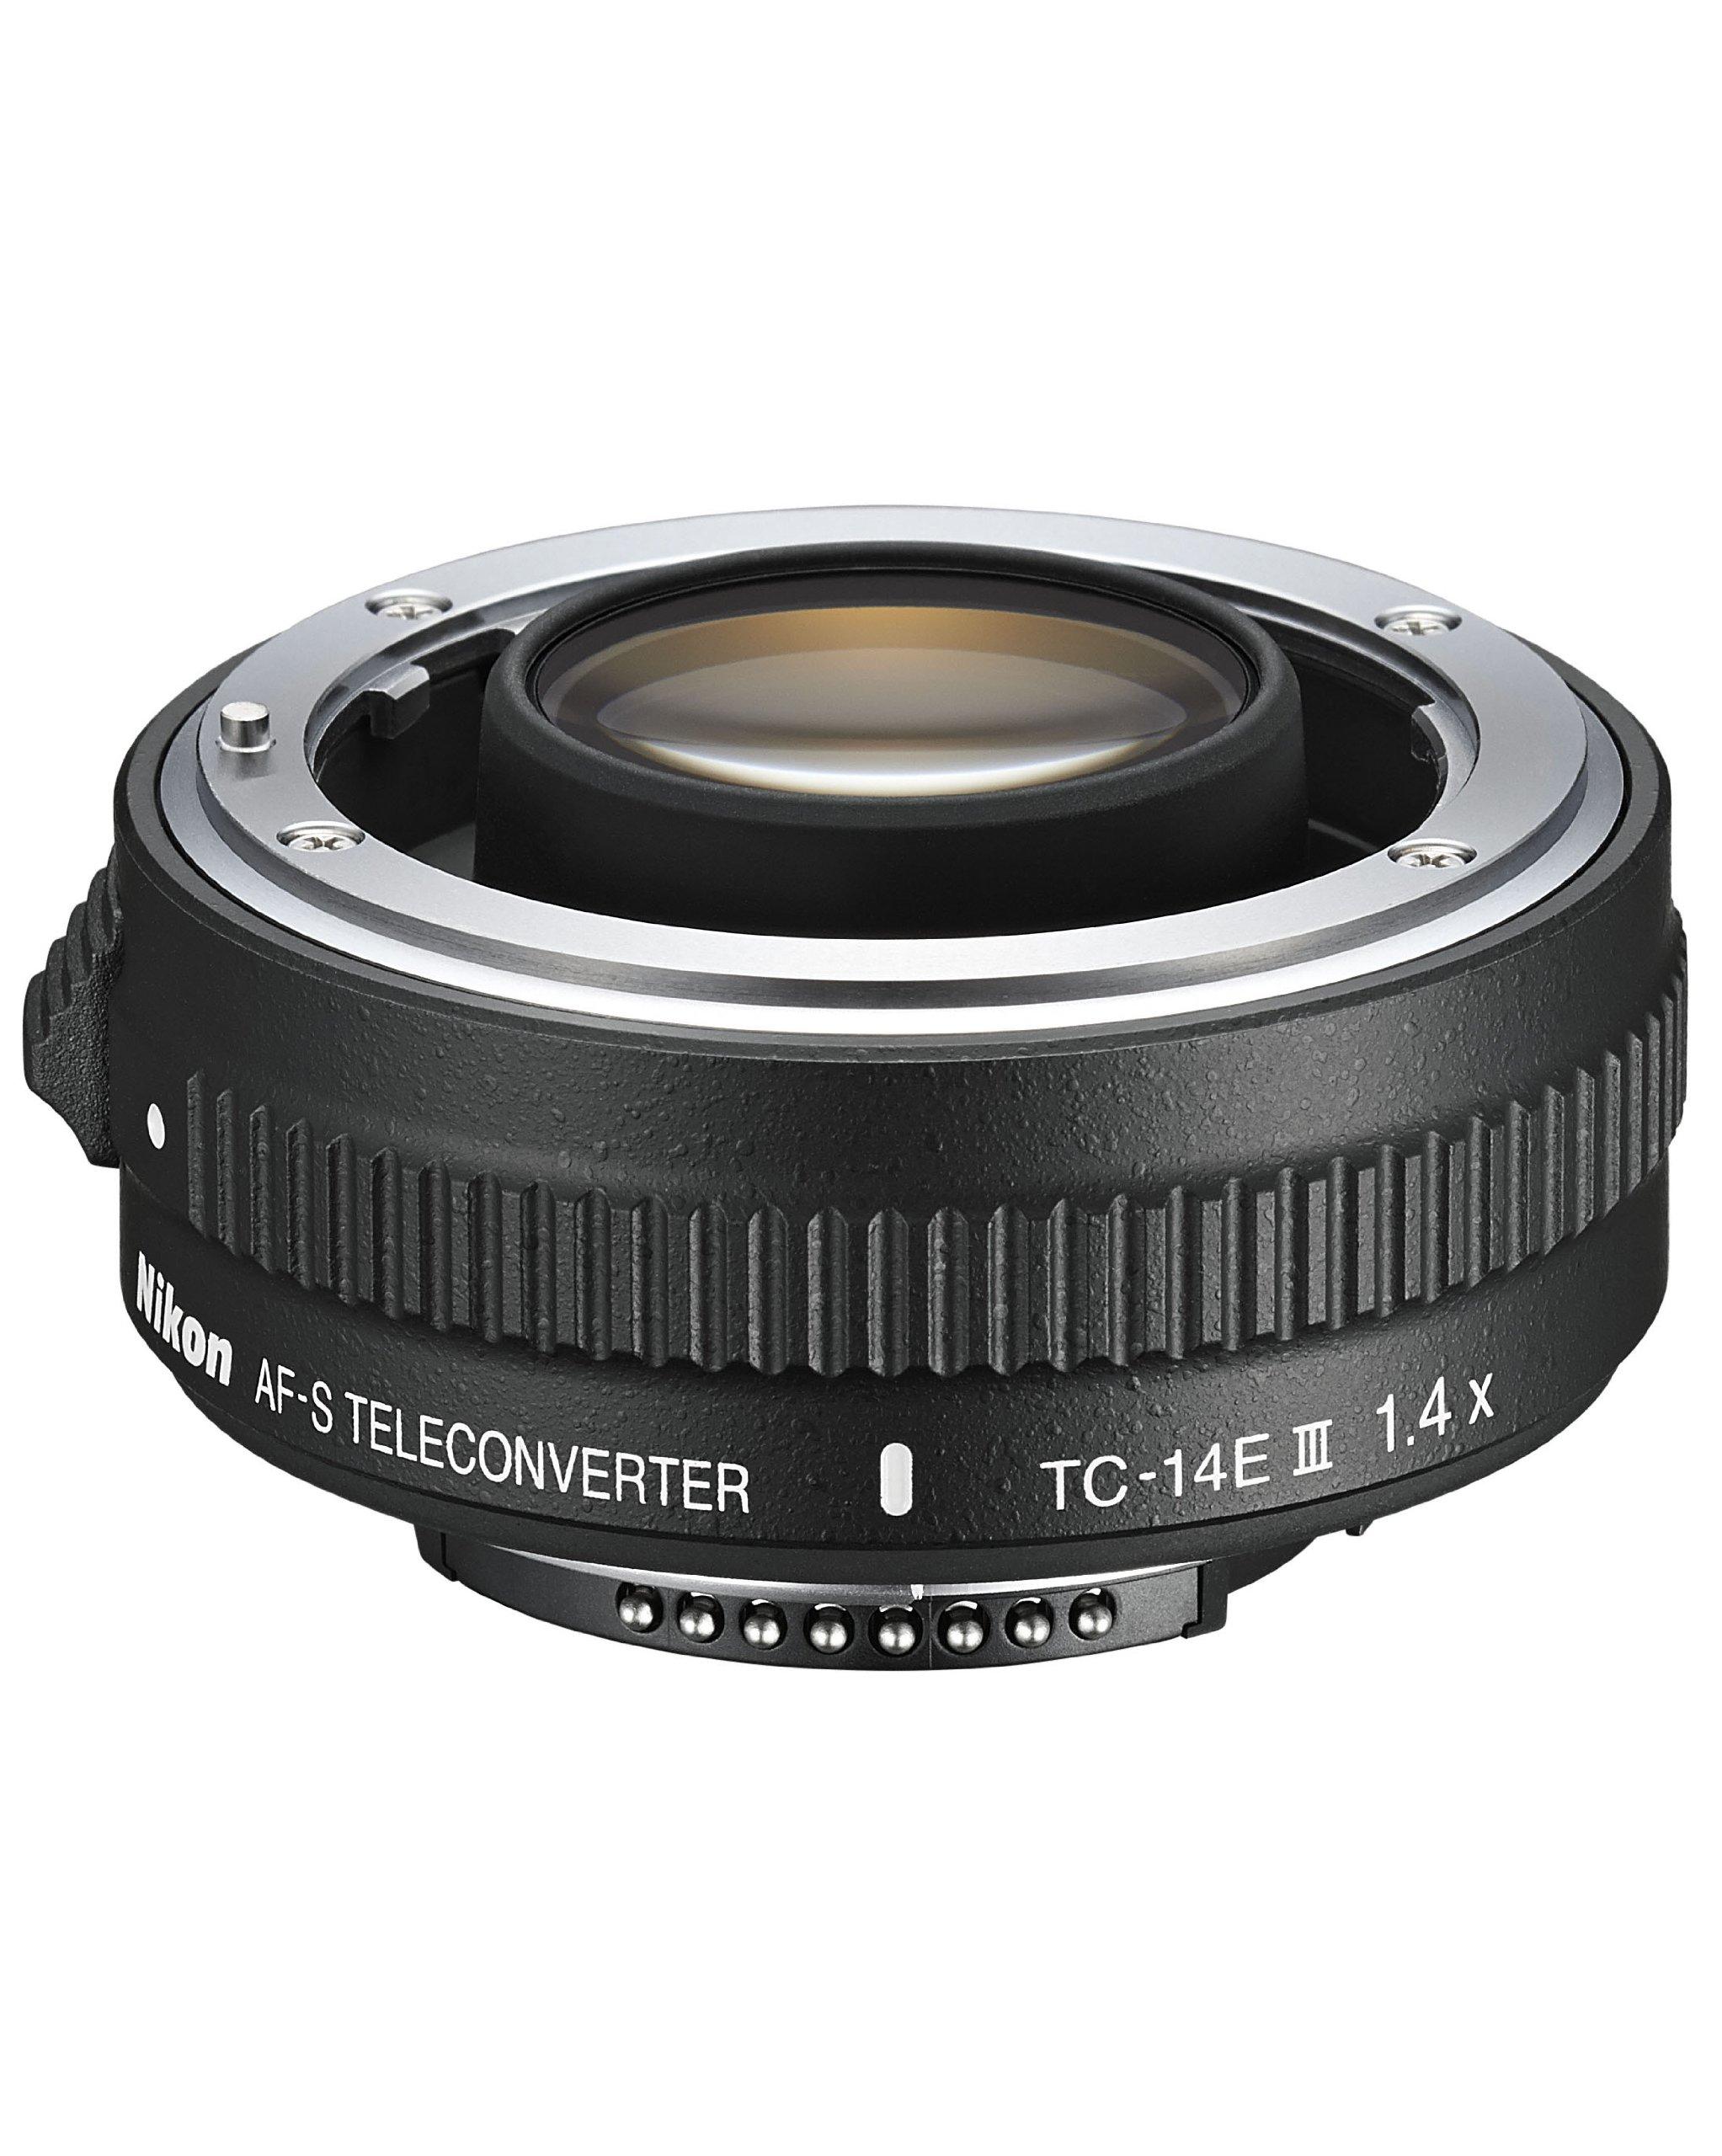 Nikon AF-S FX TC-14E III (1.4x) Teleconverter Lens with Auto Focus for Nikon DSLR Cameras by Nikon